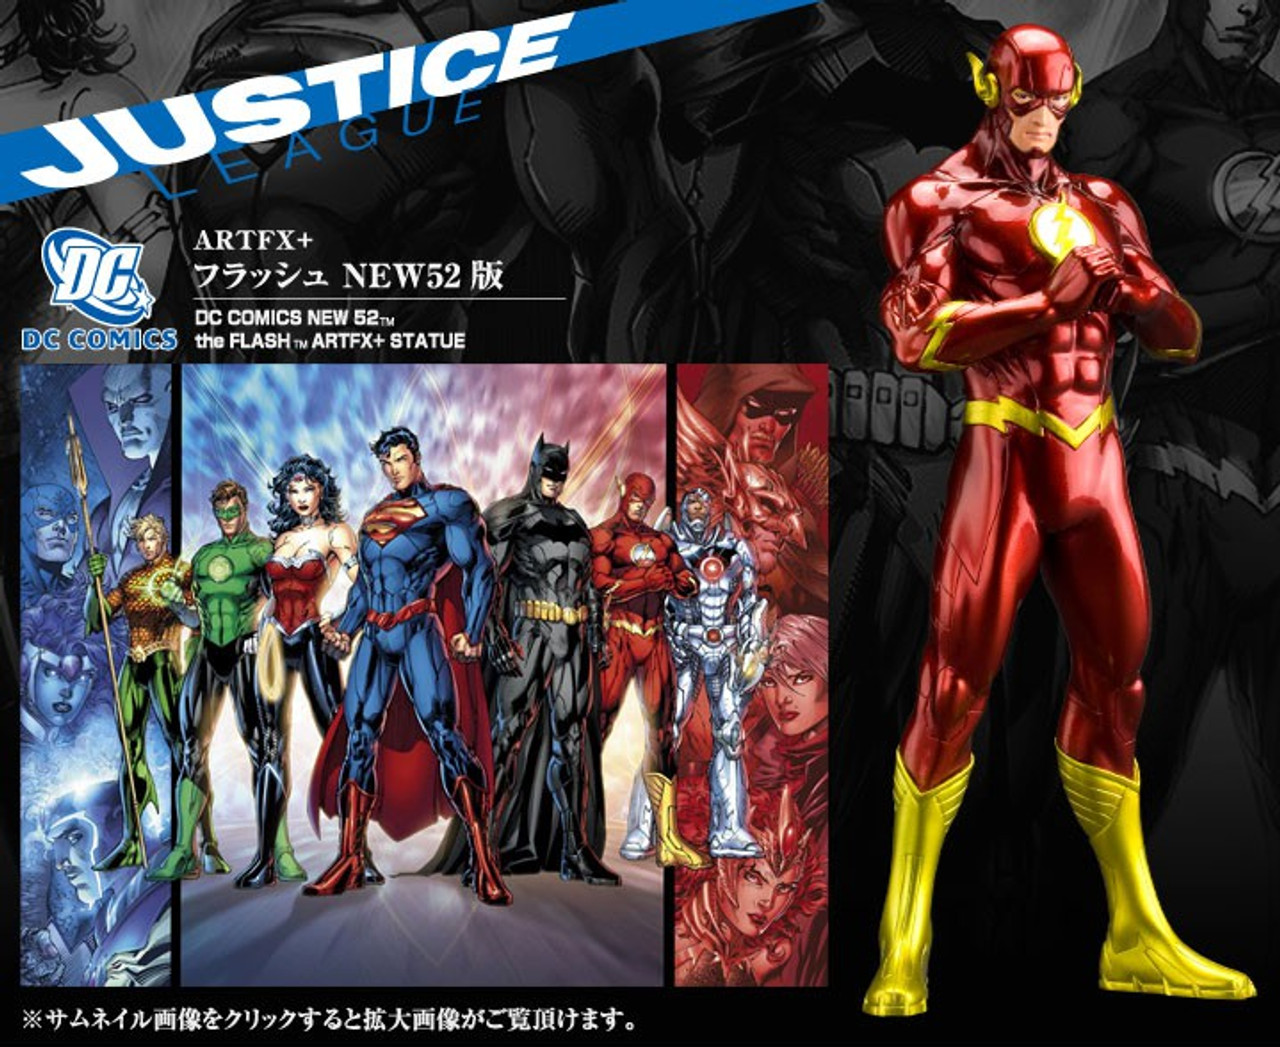 Kotobukiya Justice League Artfx Marvel The Flash New 52 Statue Action Figure Toy